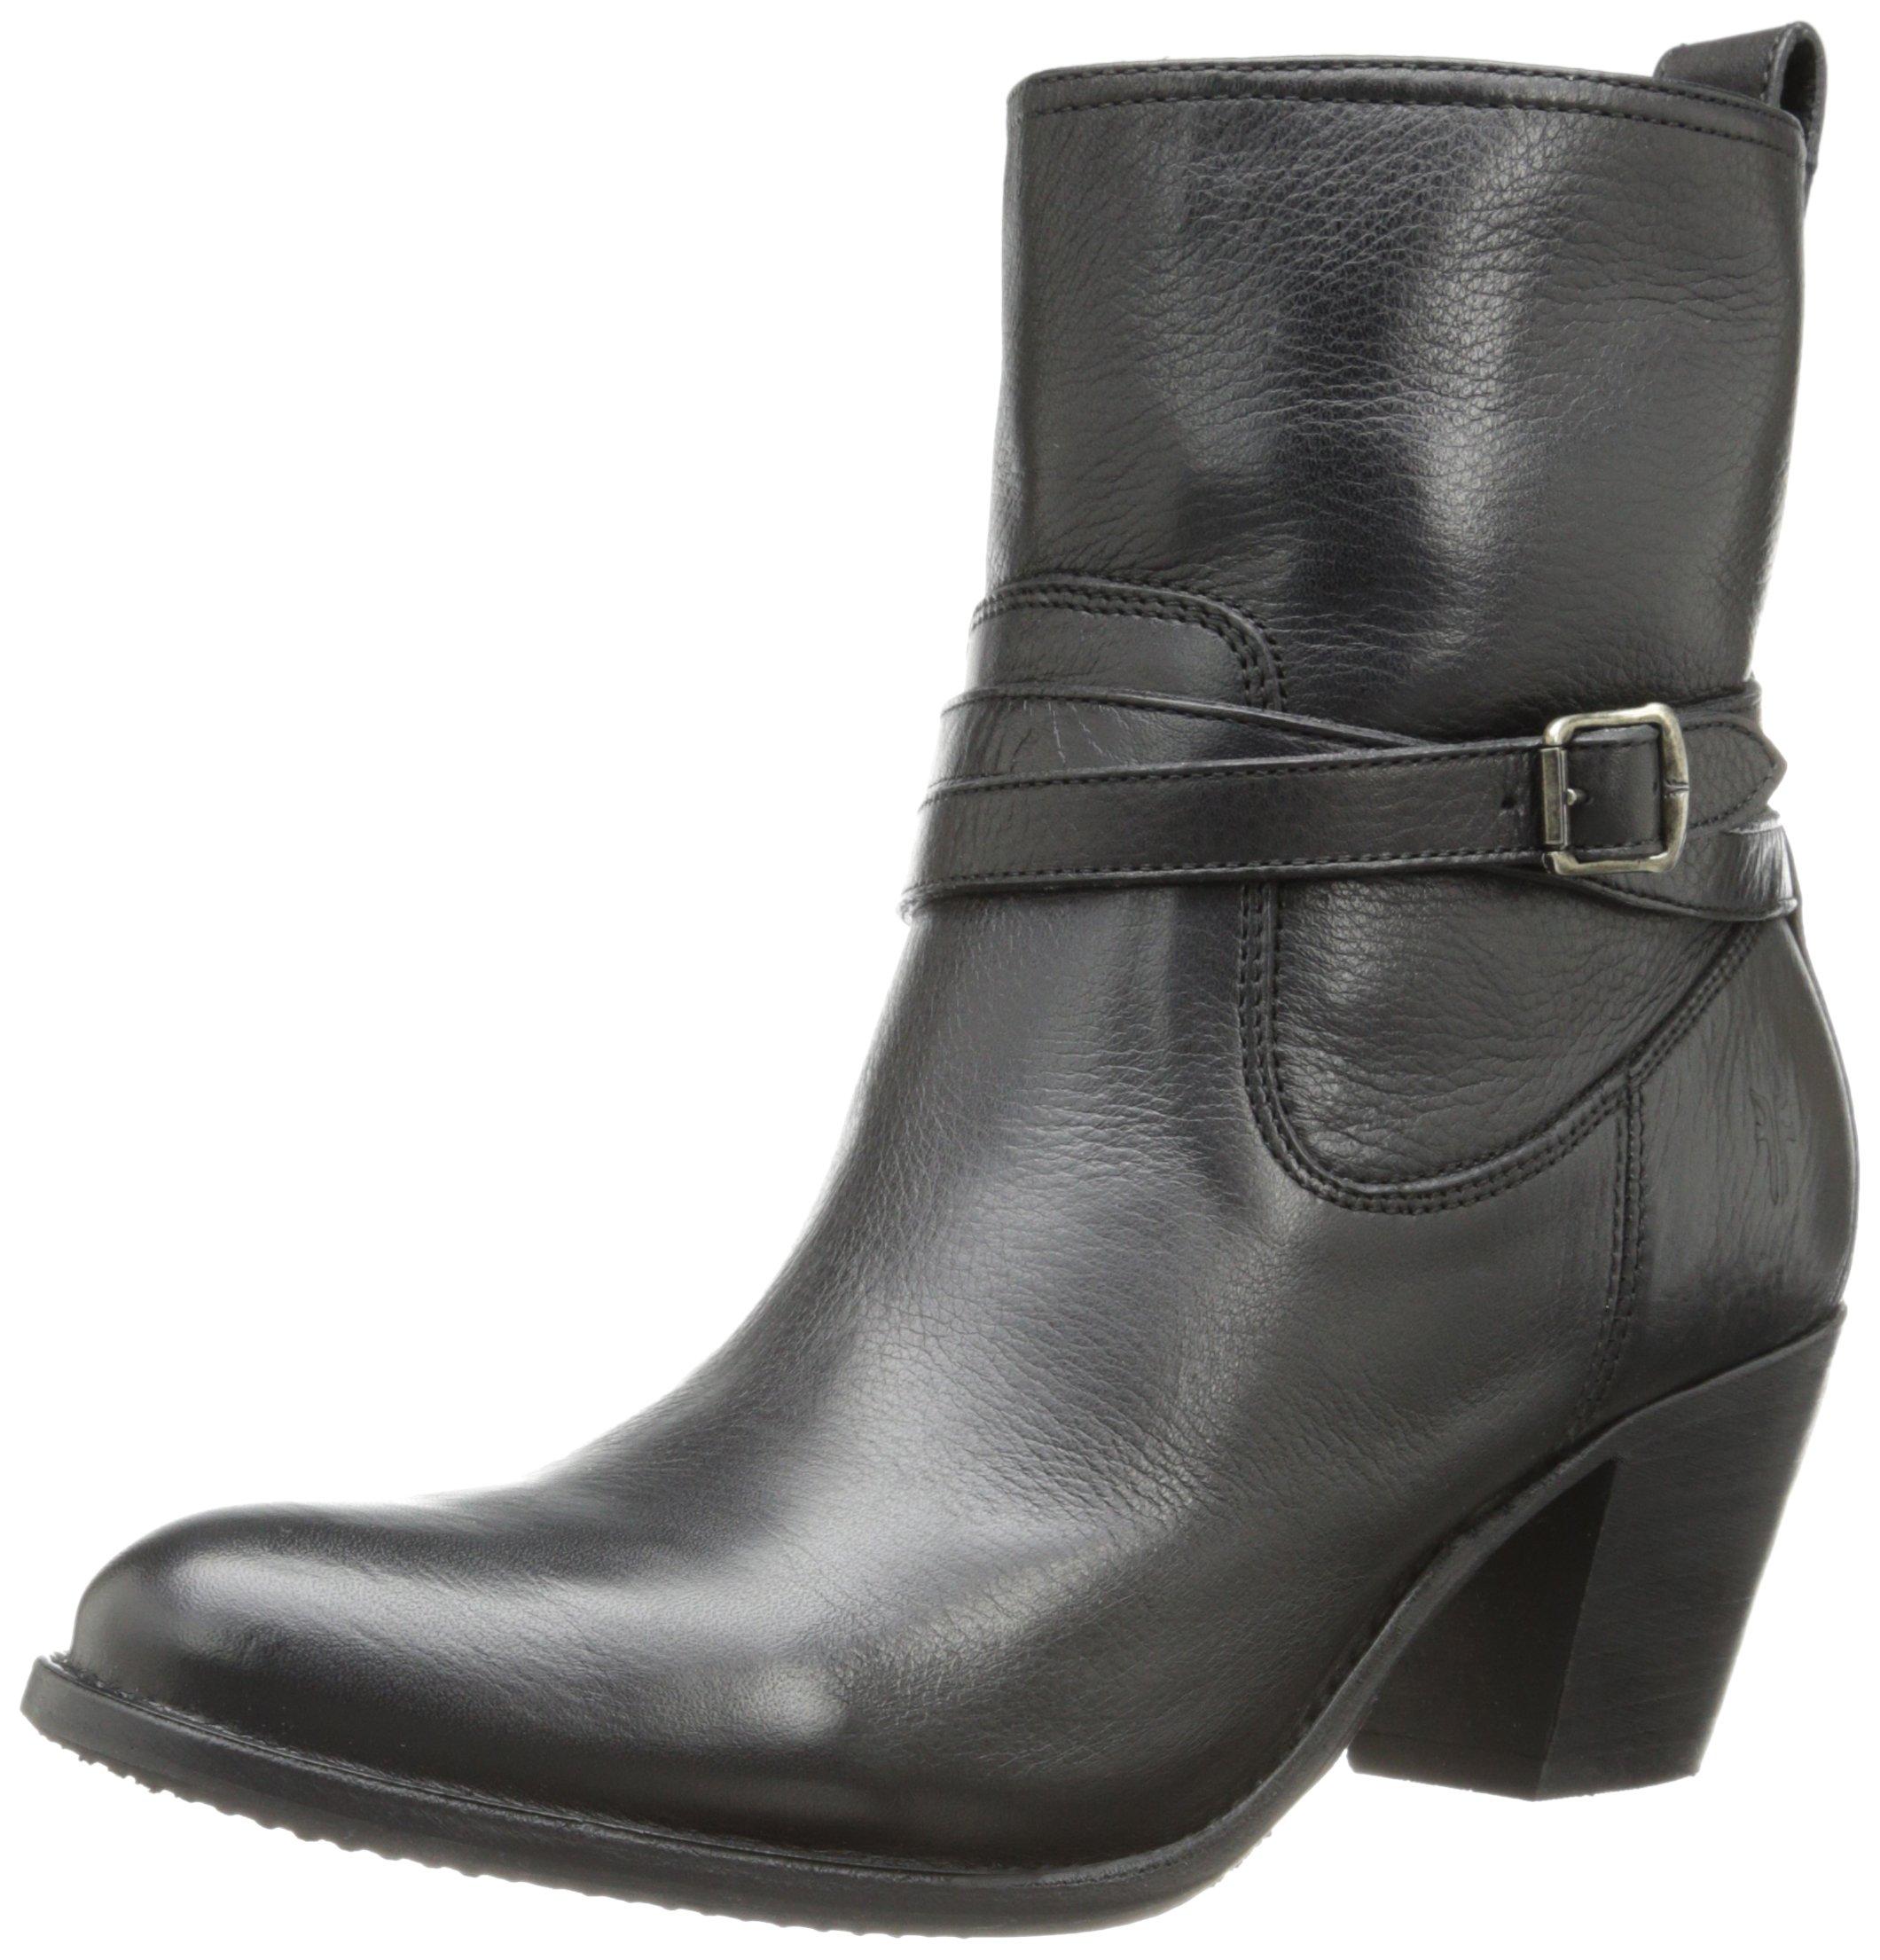 FRYE Women's Jackie Rivet Boot, Black, 10 M US by FRYE